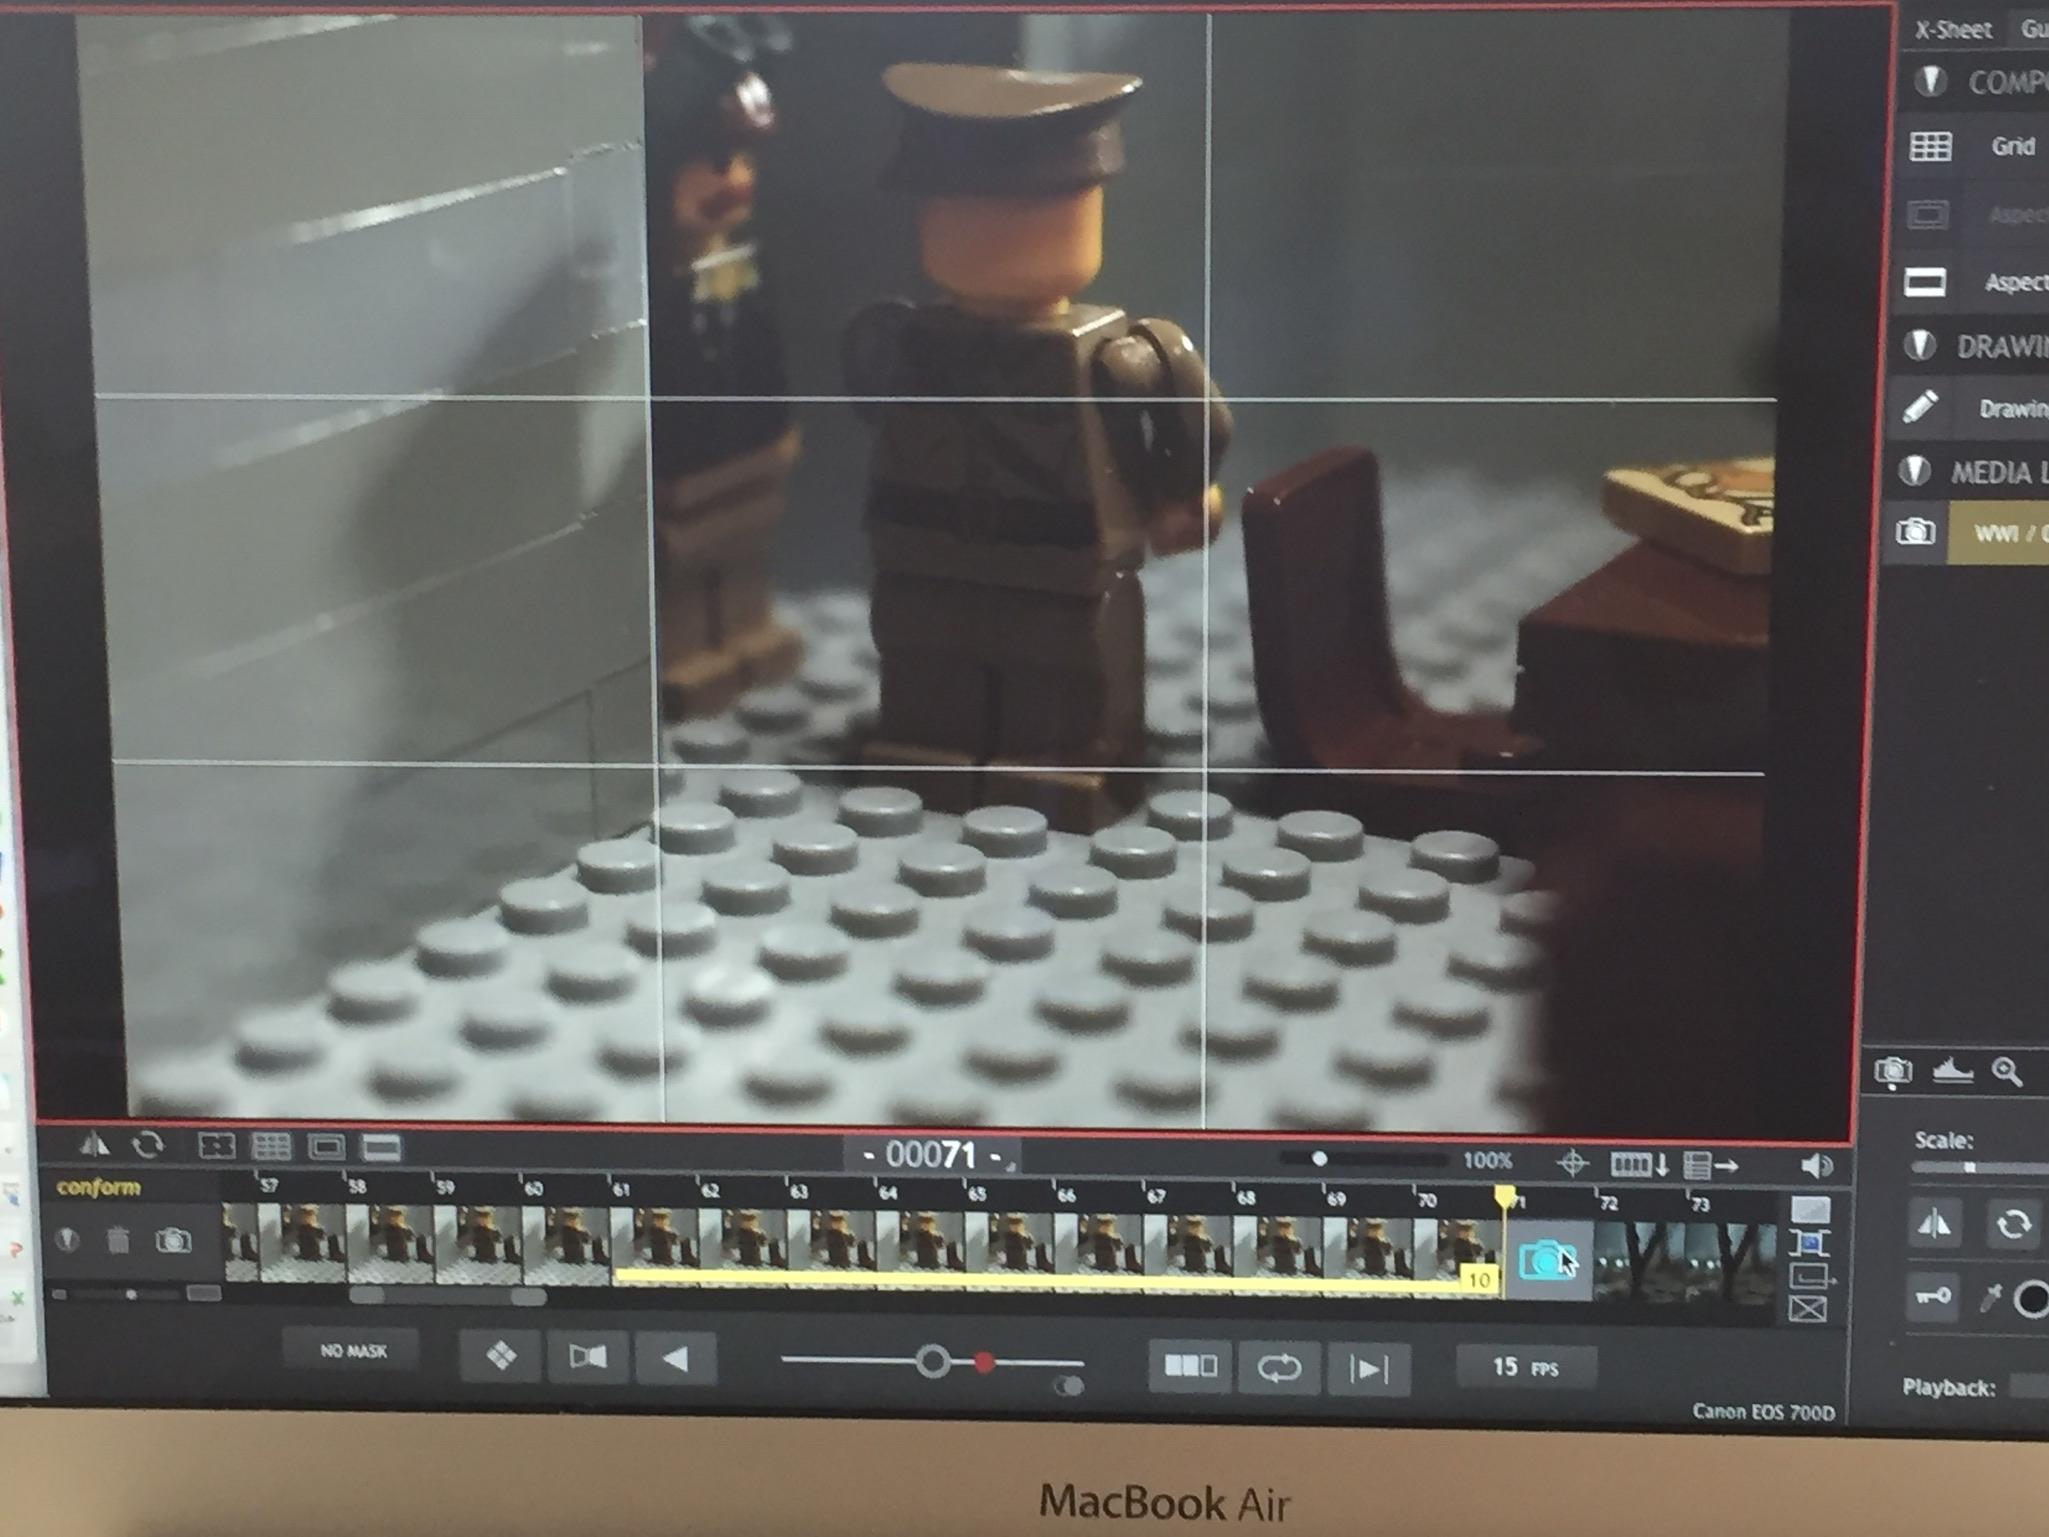 http://bricksafe.com/files/DragonBrickStudios/bim/ww1-brickfilm/IMG_0014.jpg